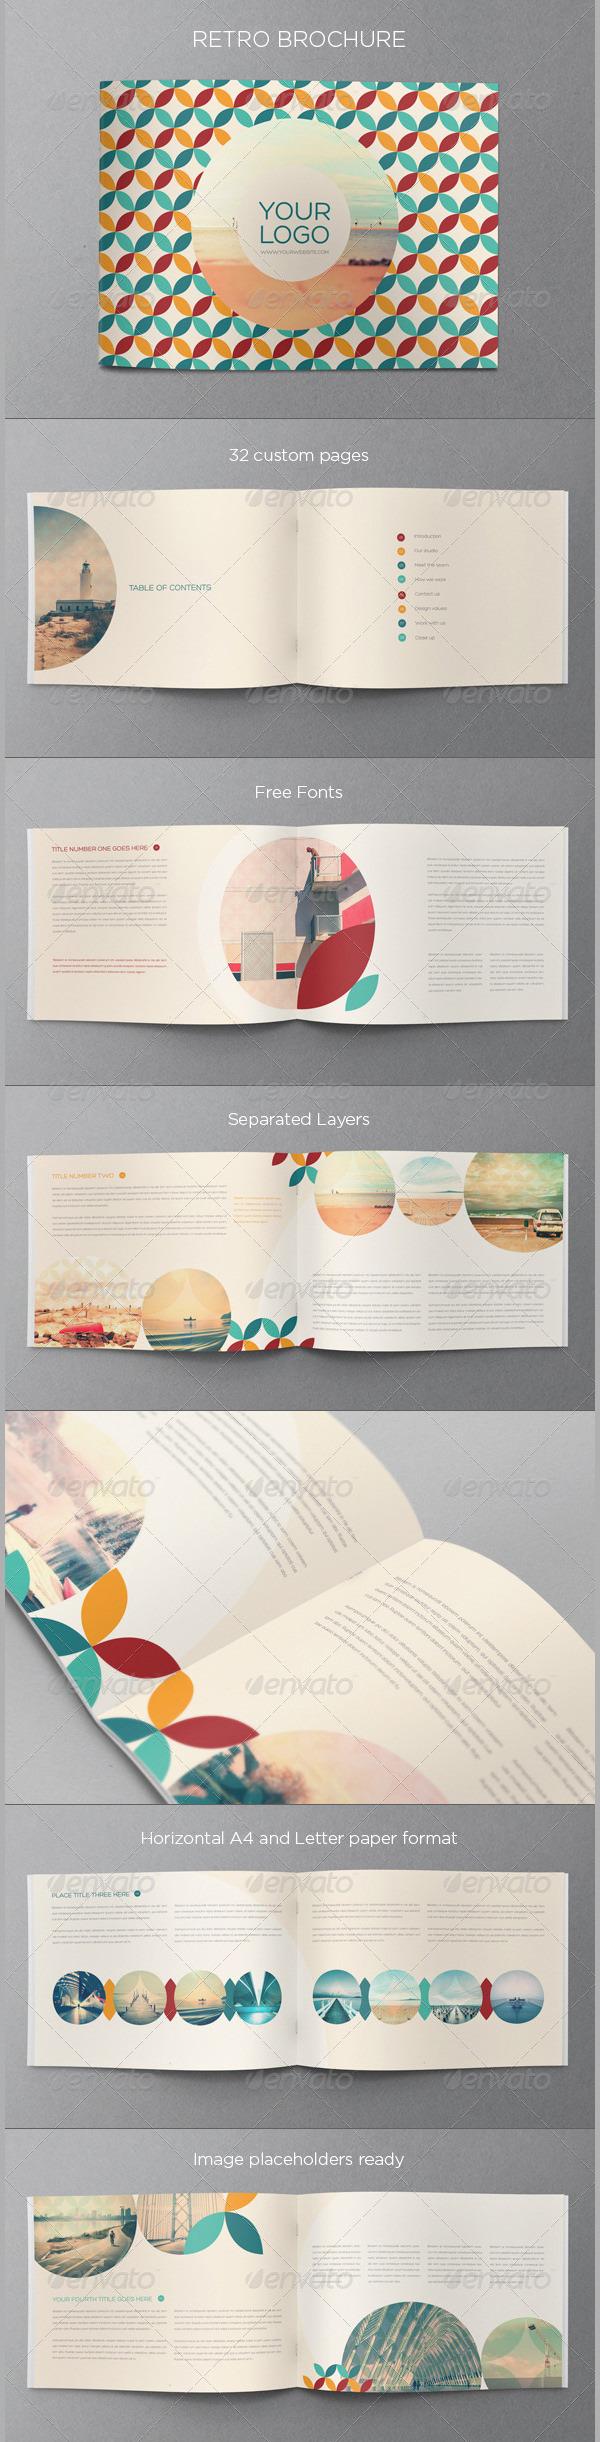 Retro Brochure Sample